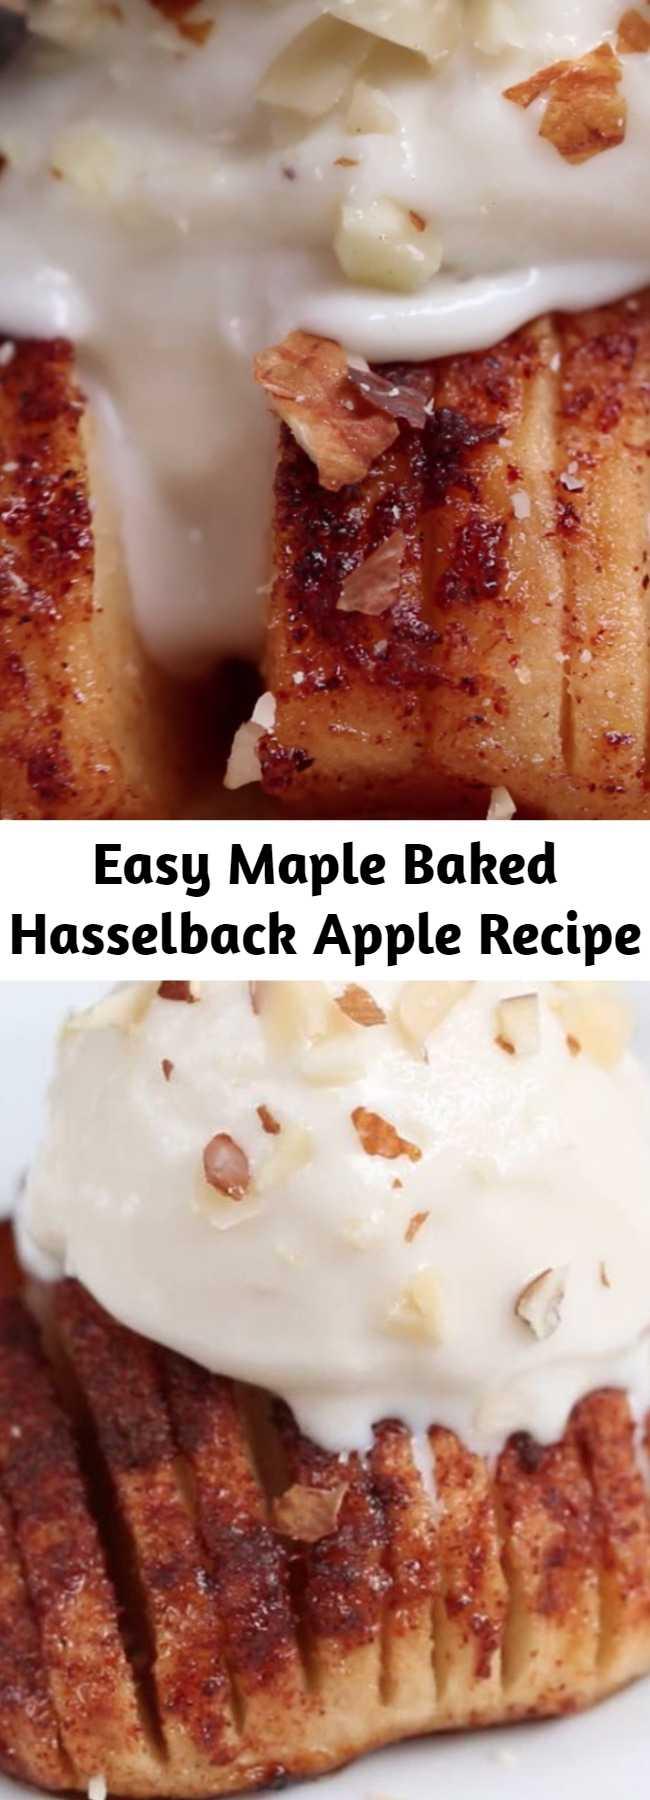 Easy Maple Baked Hasselback Apple Recipe - You Should Make These Maple Baked Hasselback Apples For Dessert